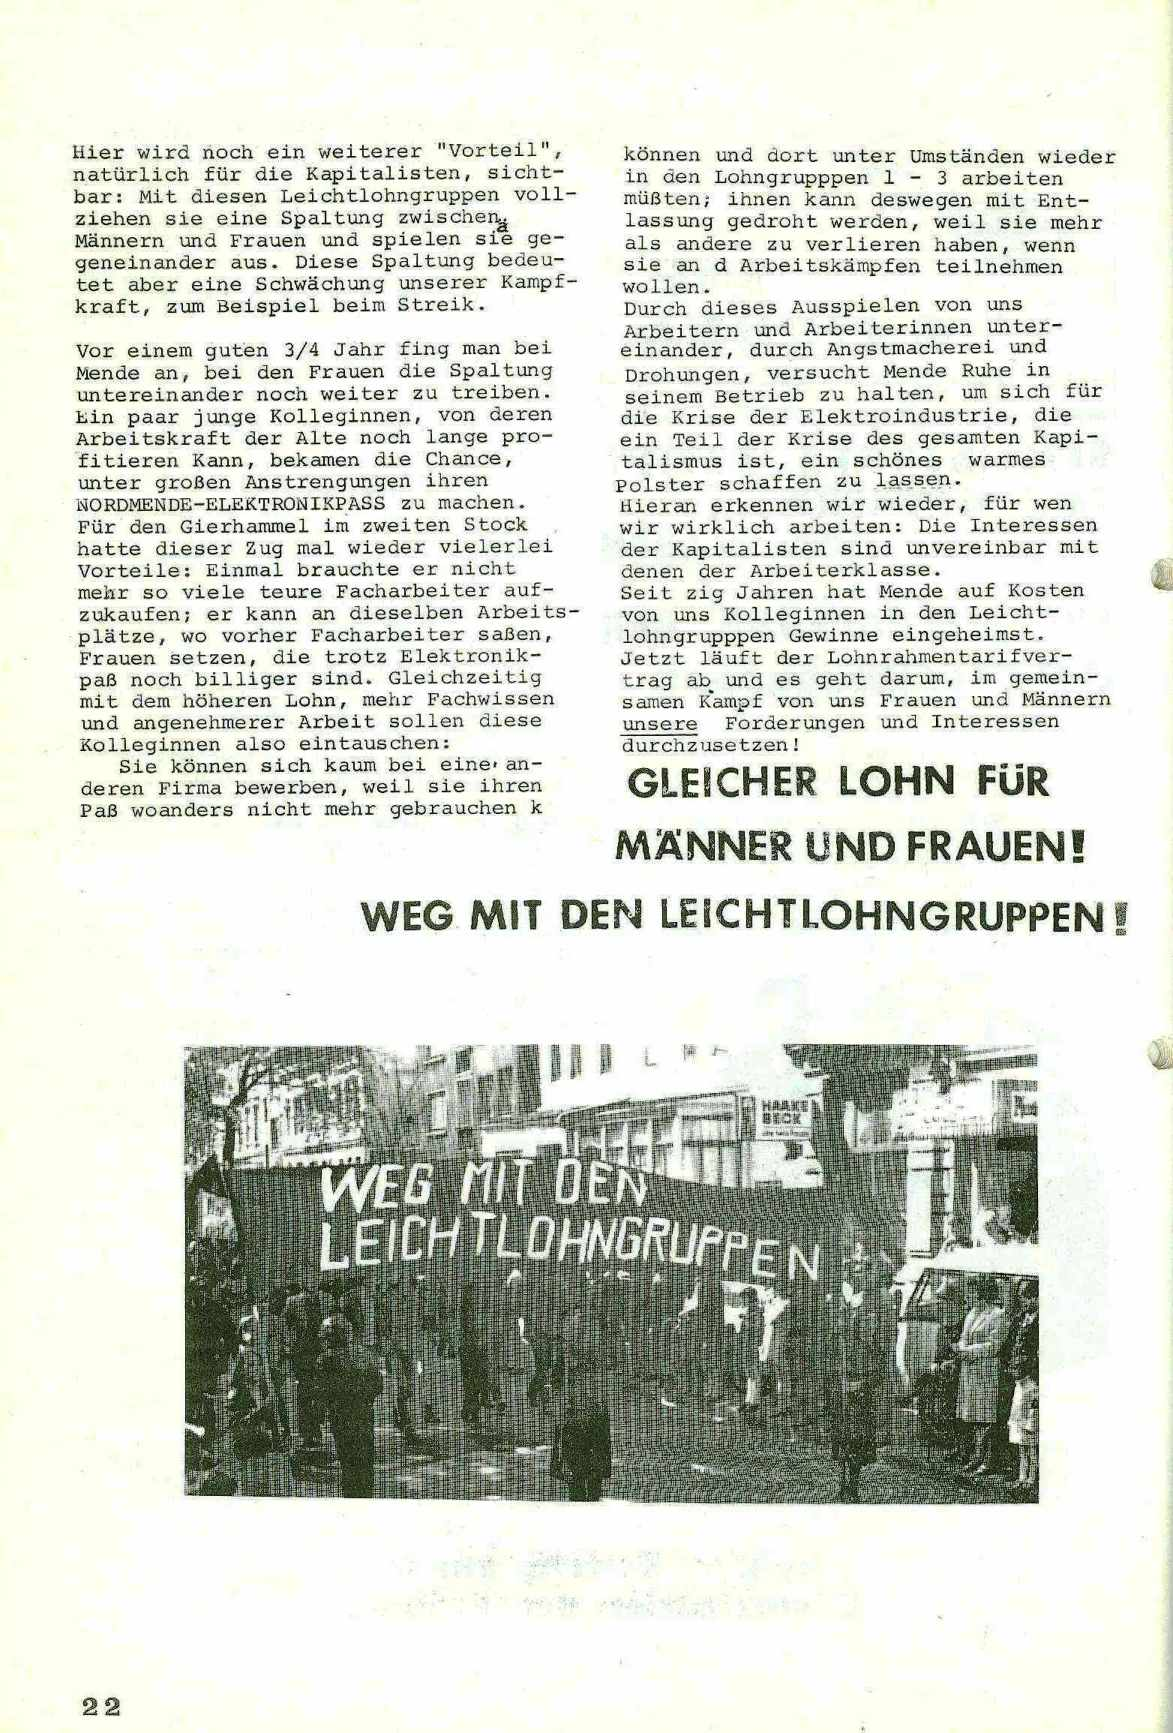 Bremen_KAK167